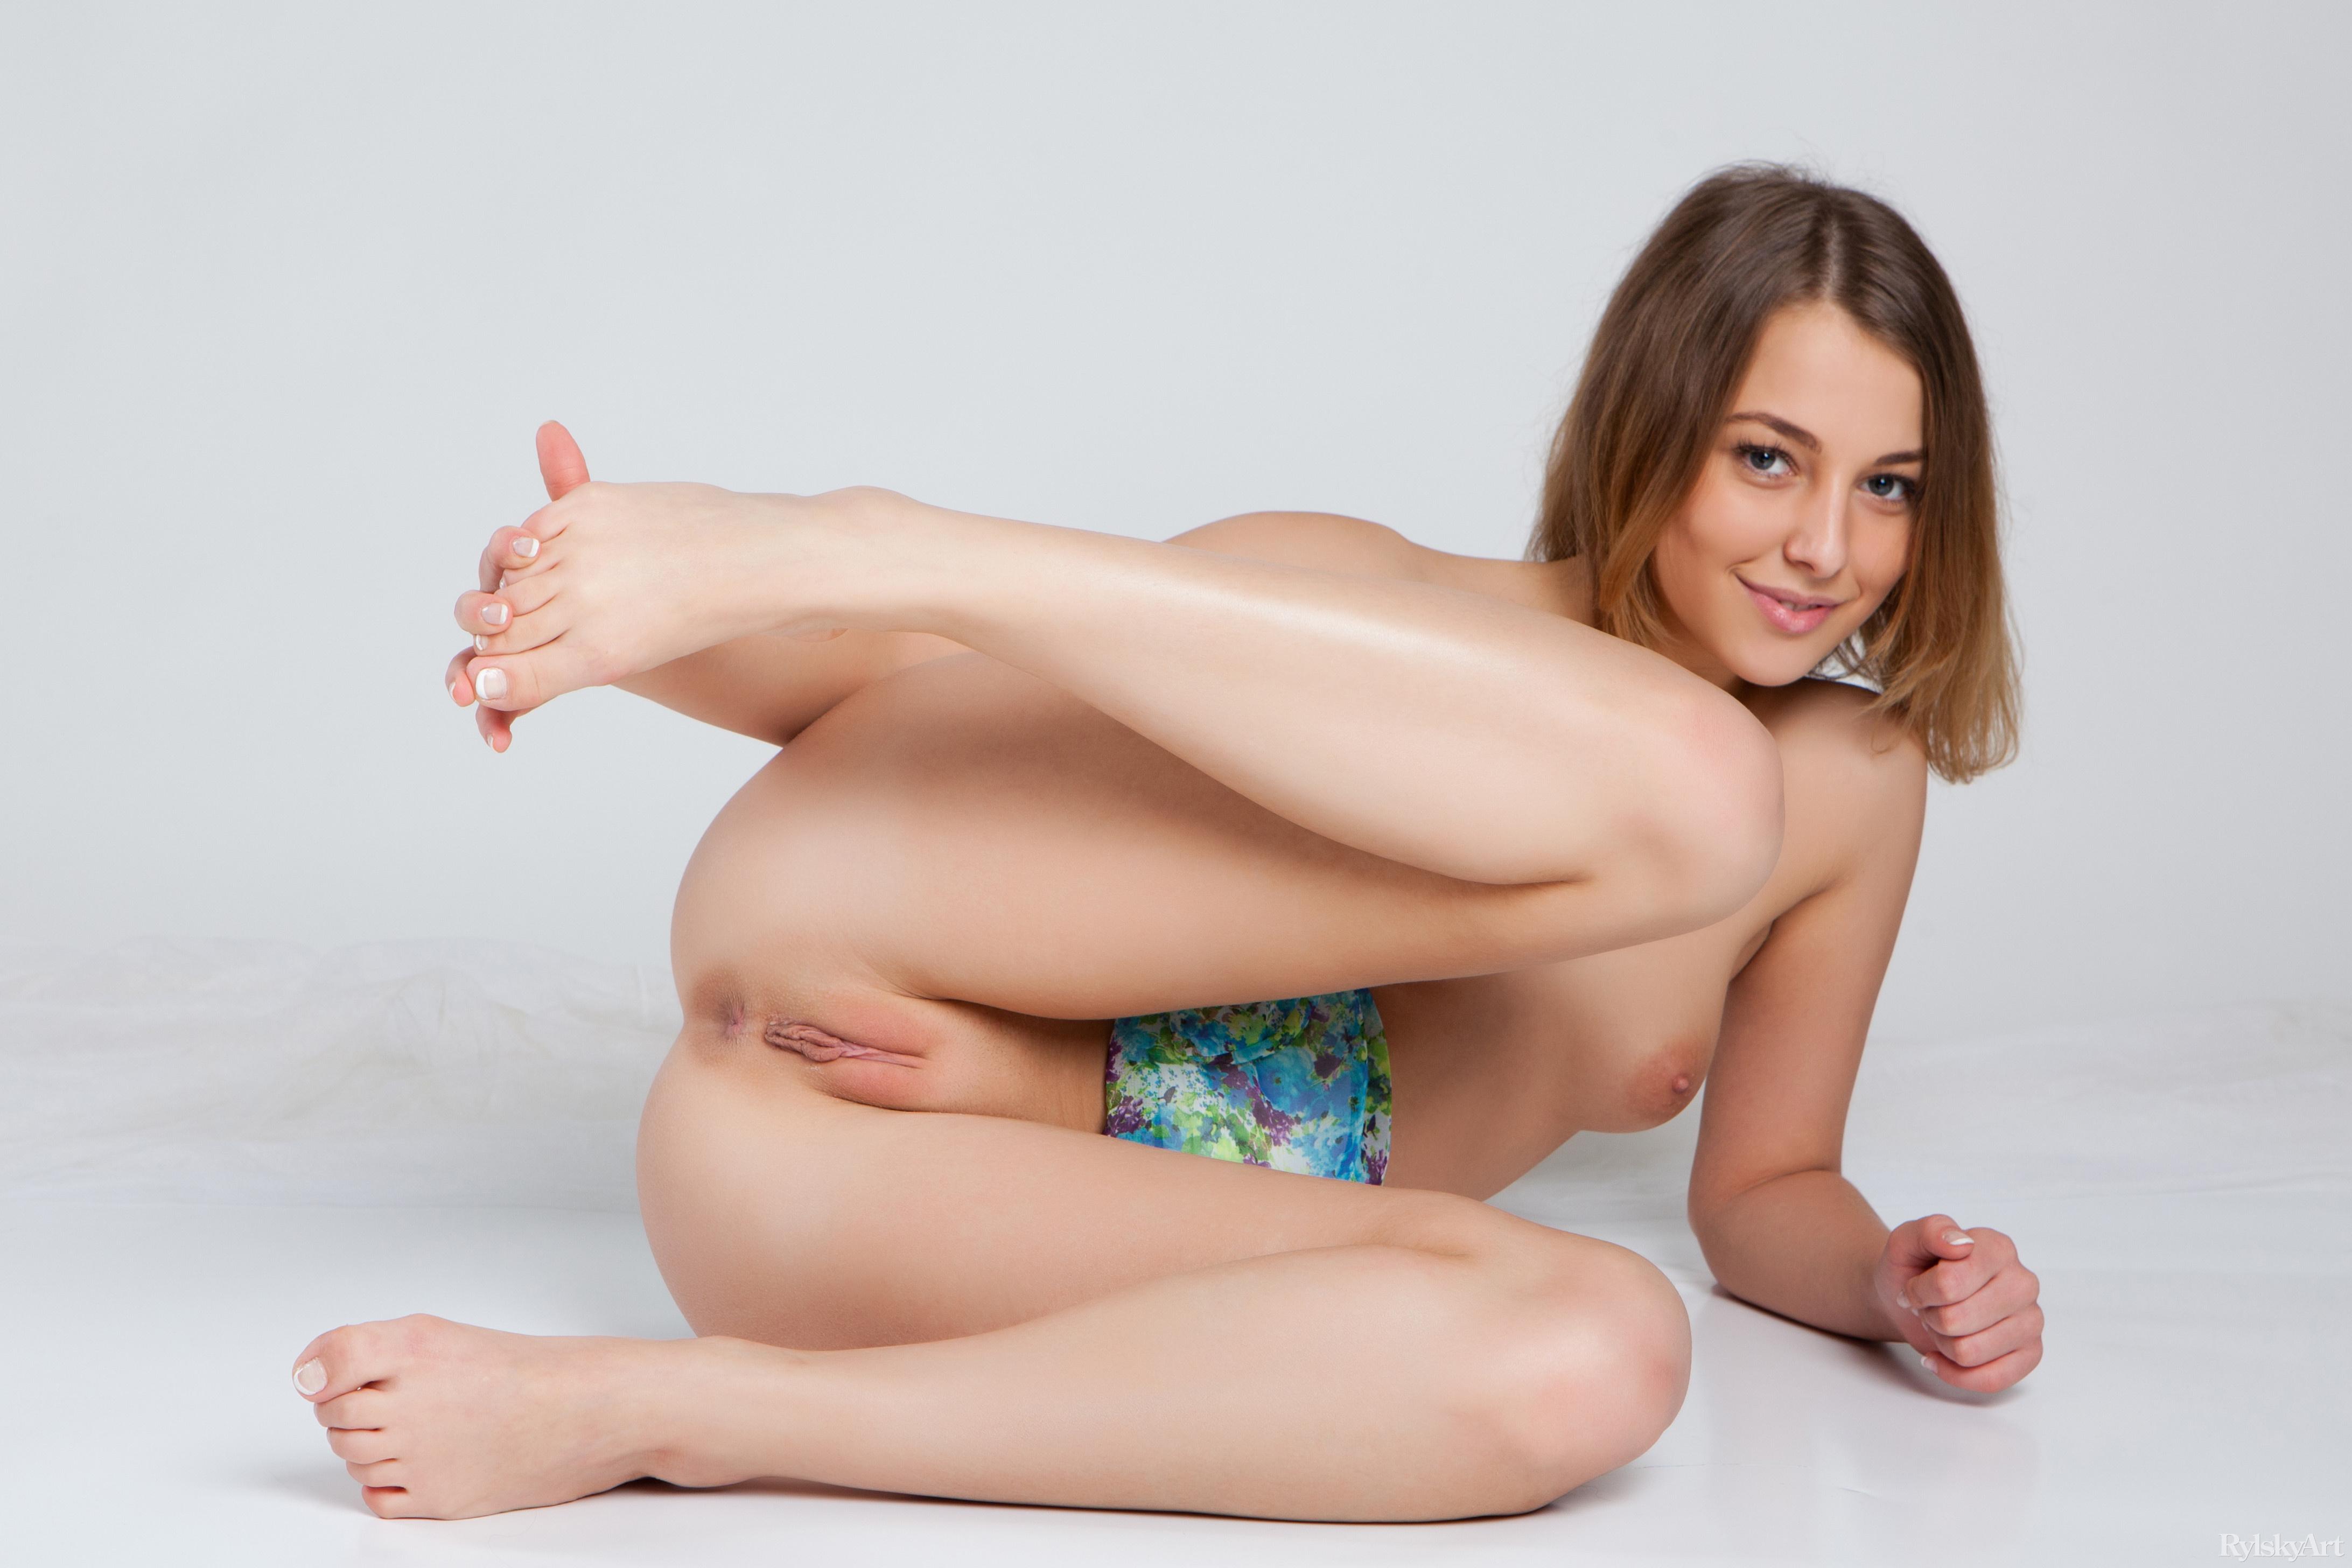 Fanny Ragazze Nude